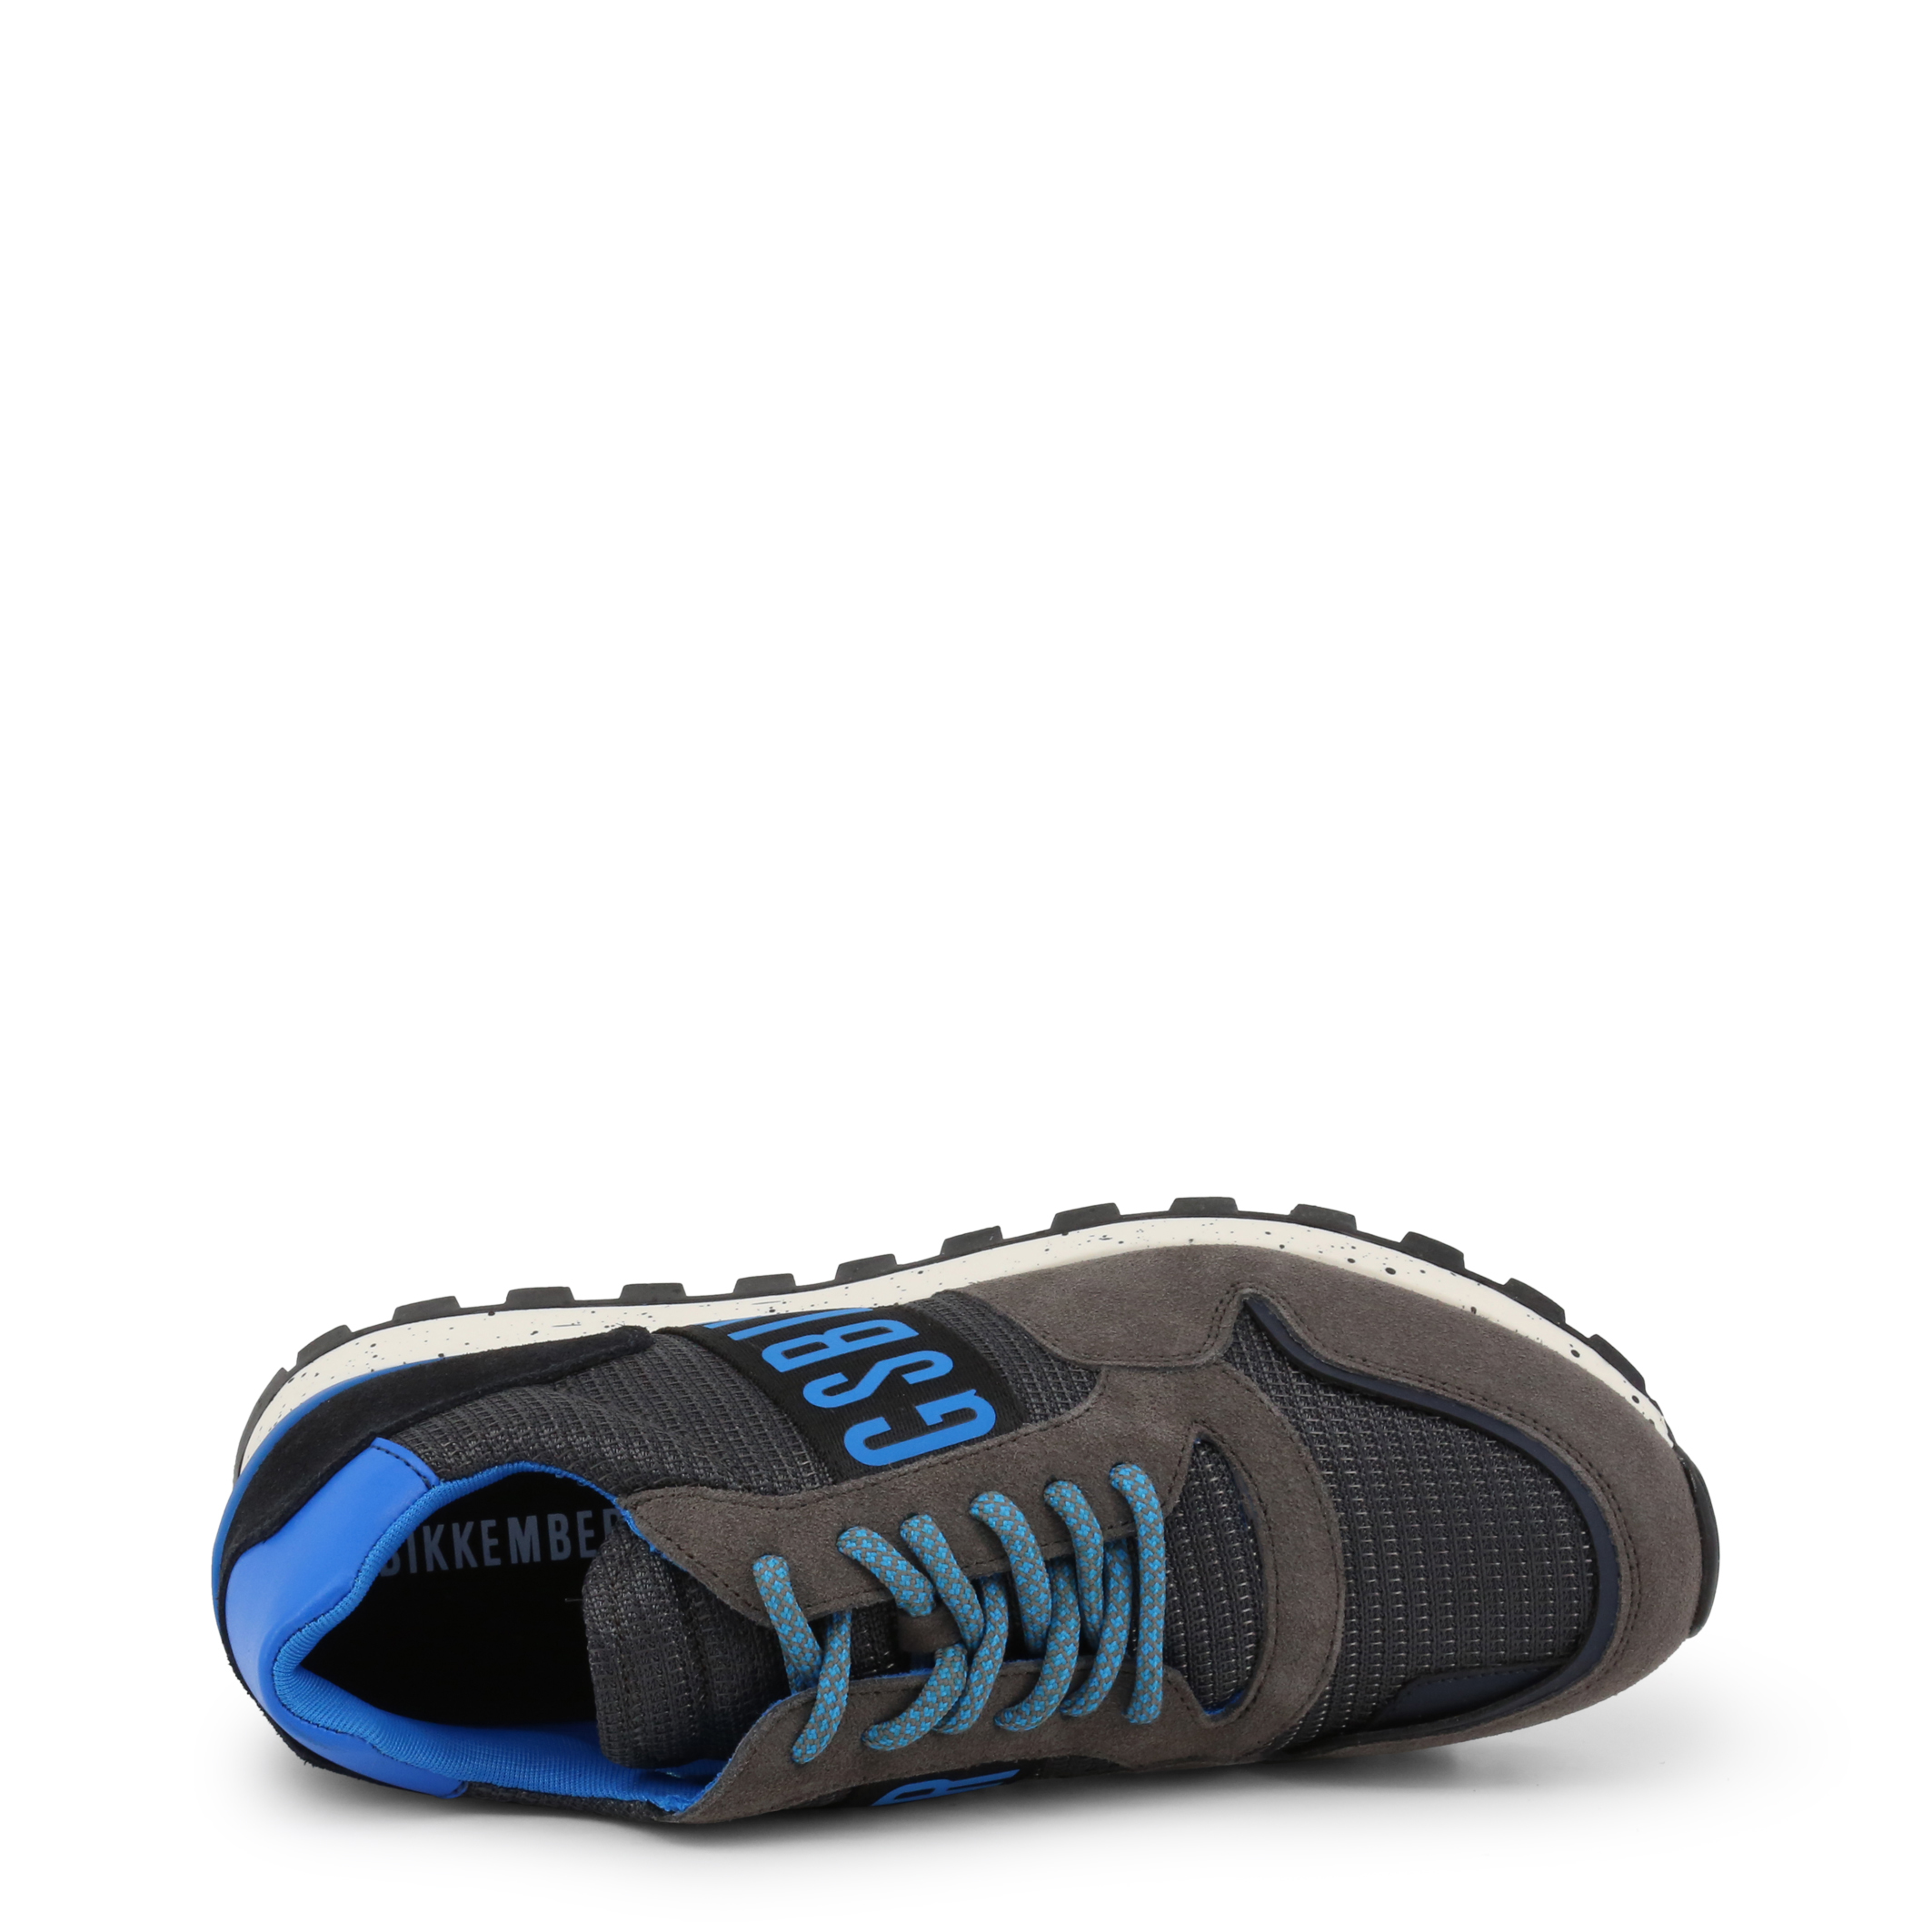 Sneakers-Bikkembergs-FEND-ER-2356-Uomo-Grigio-101354 miniatura 3